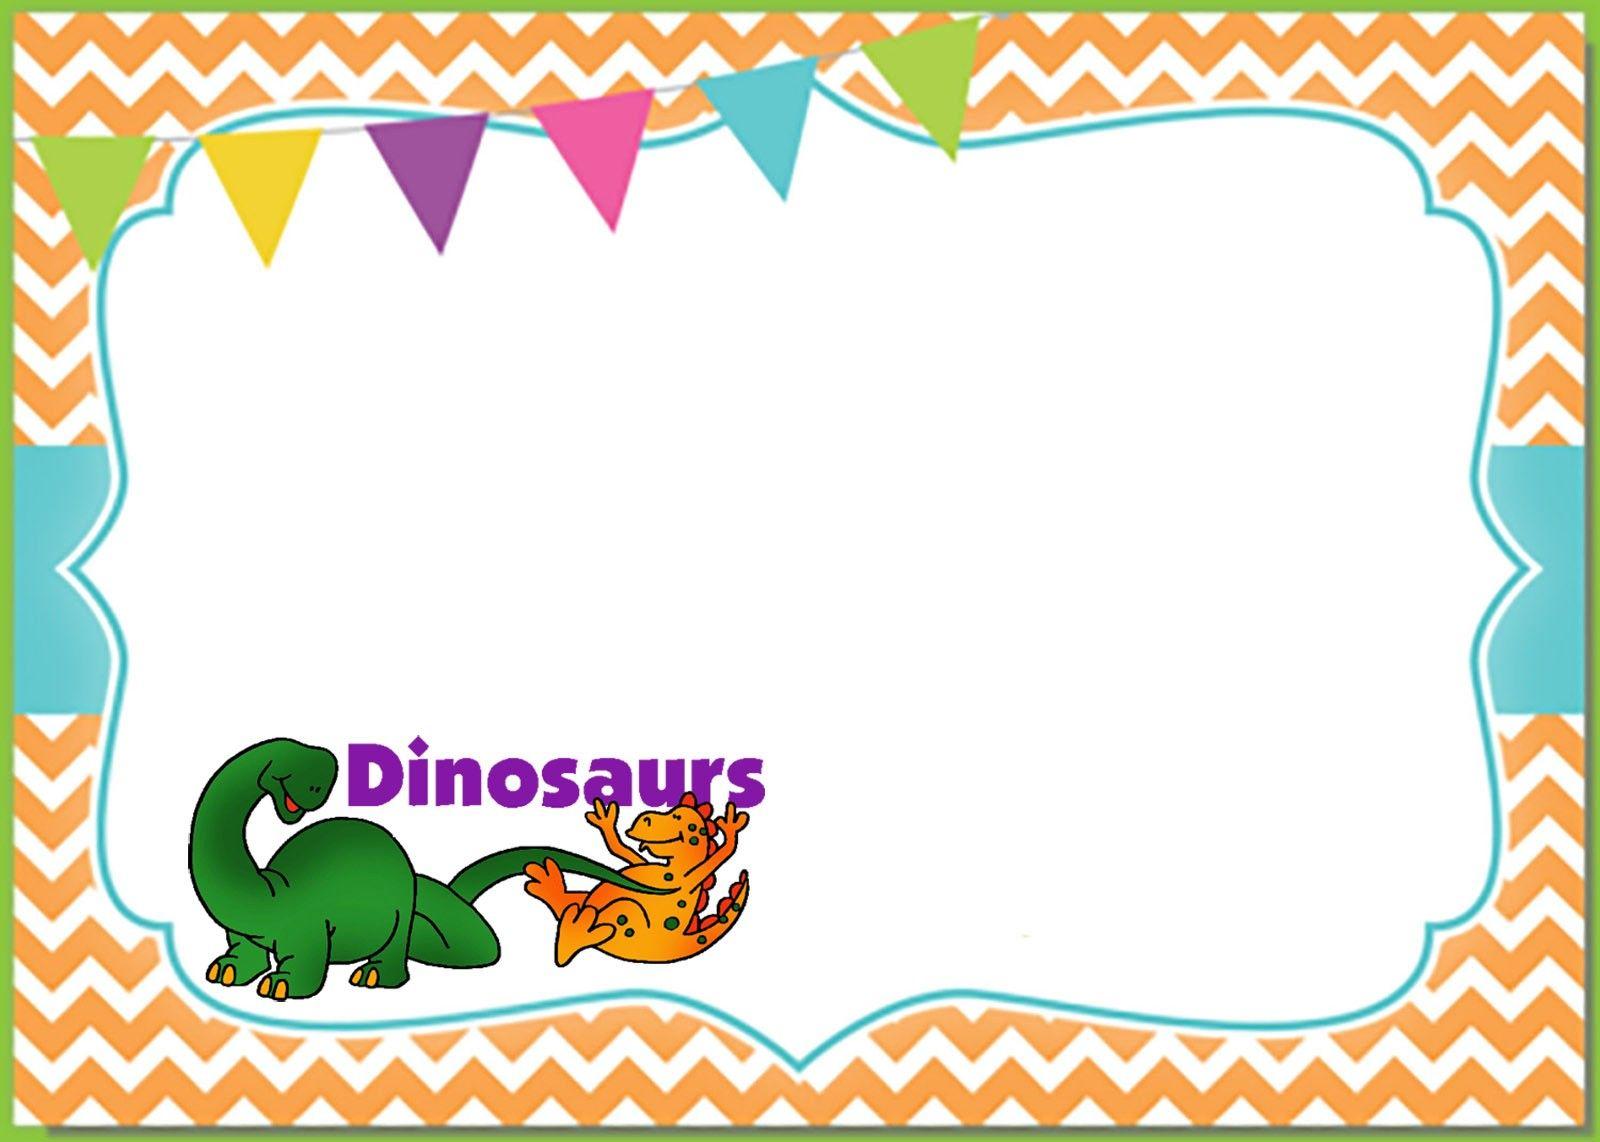 Dinosaur Party Invitation Card Dinosaur Birthday Party Invitations Dinosaur Party Invitations Party Invite Template